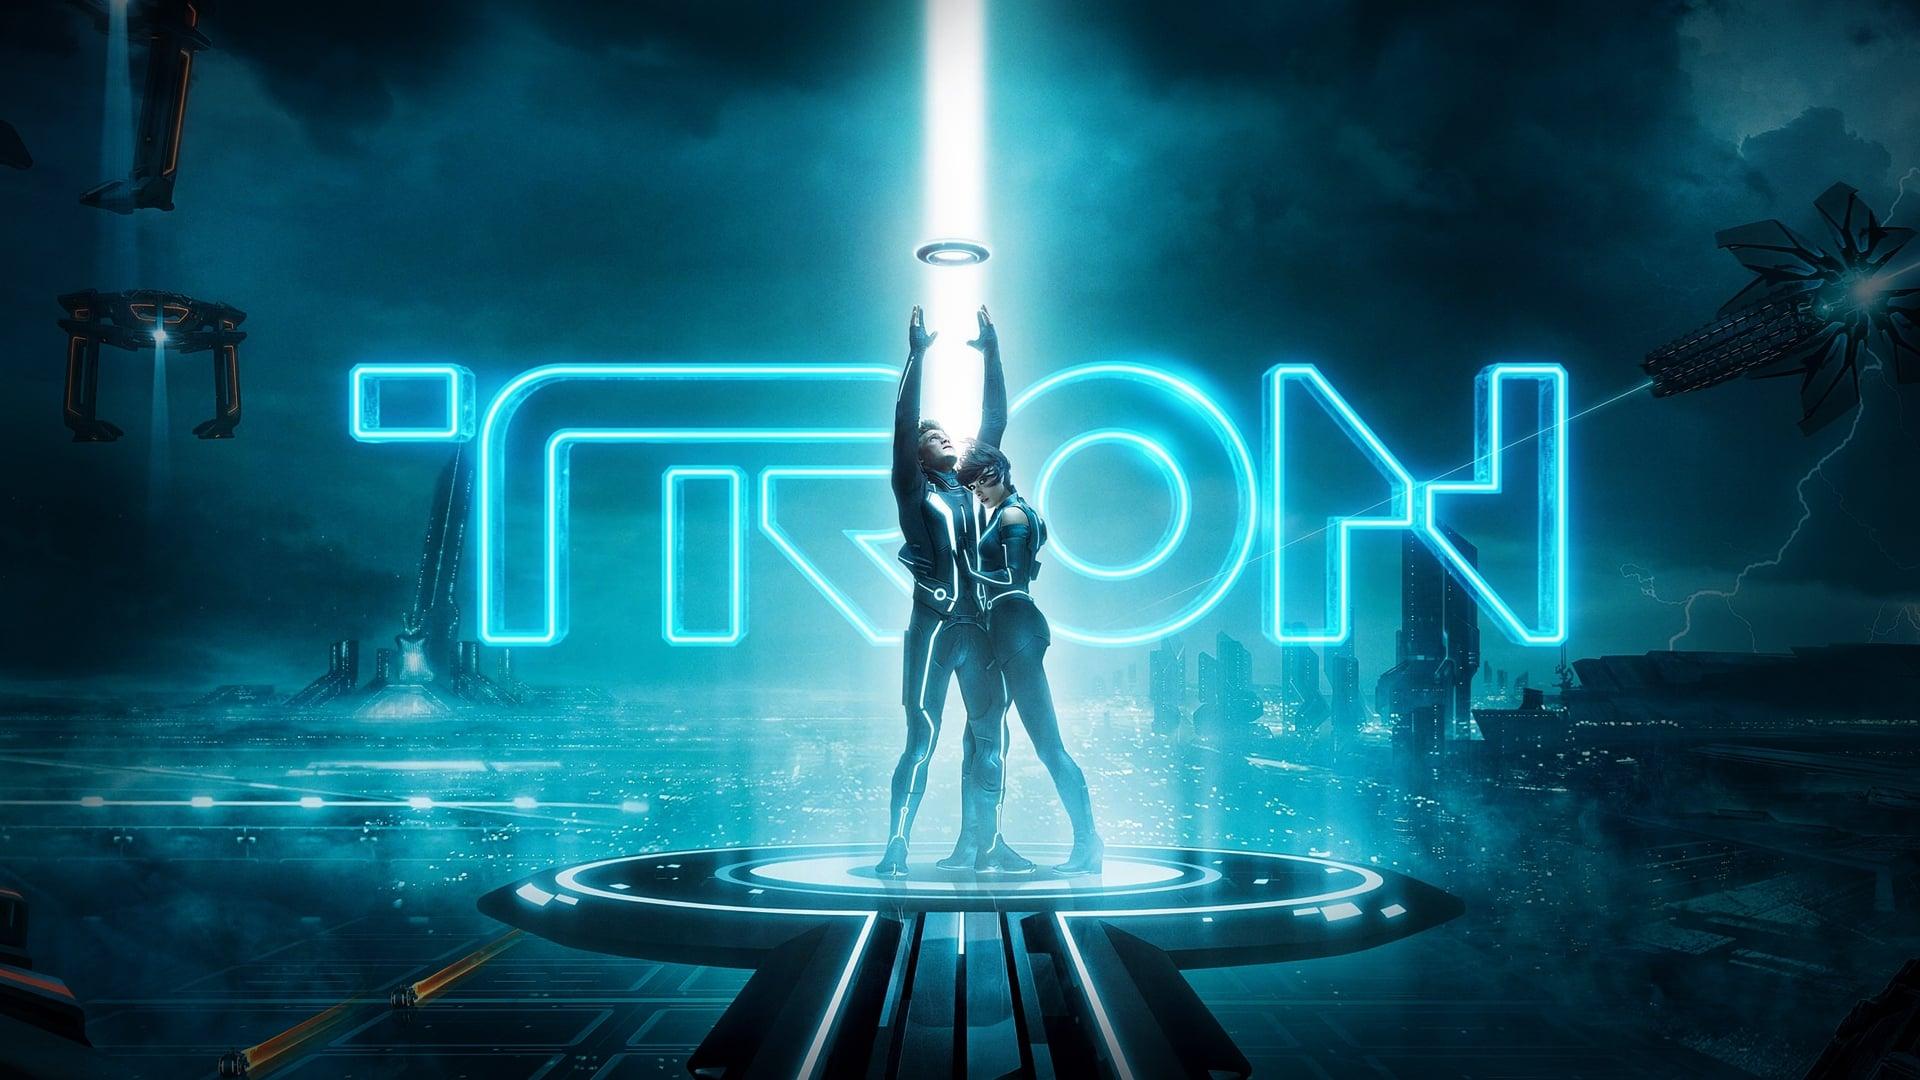 Filmszene aus TRON: Legacy